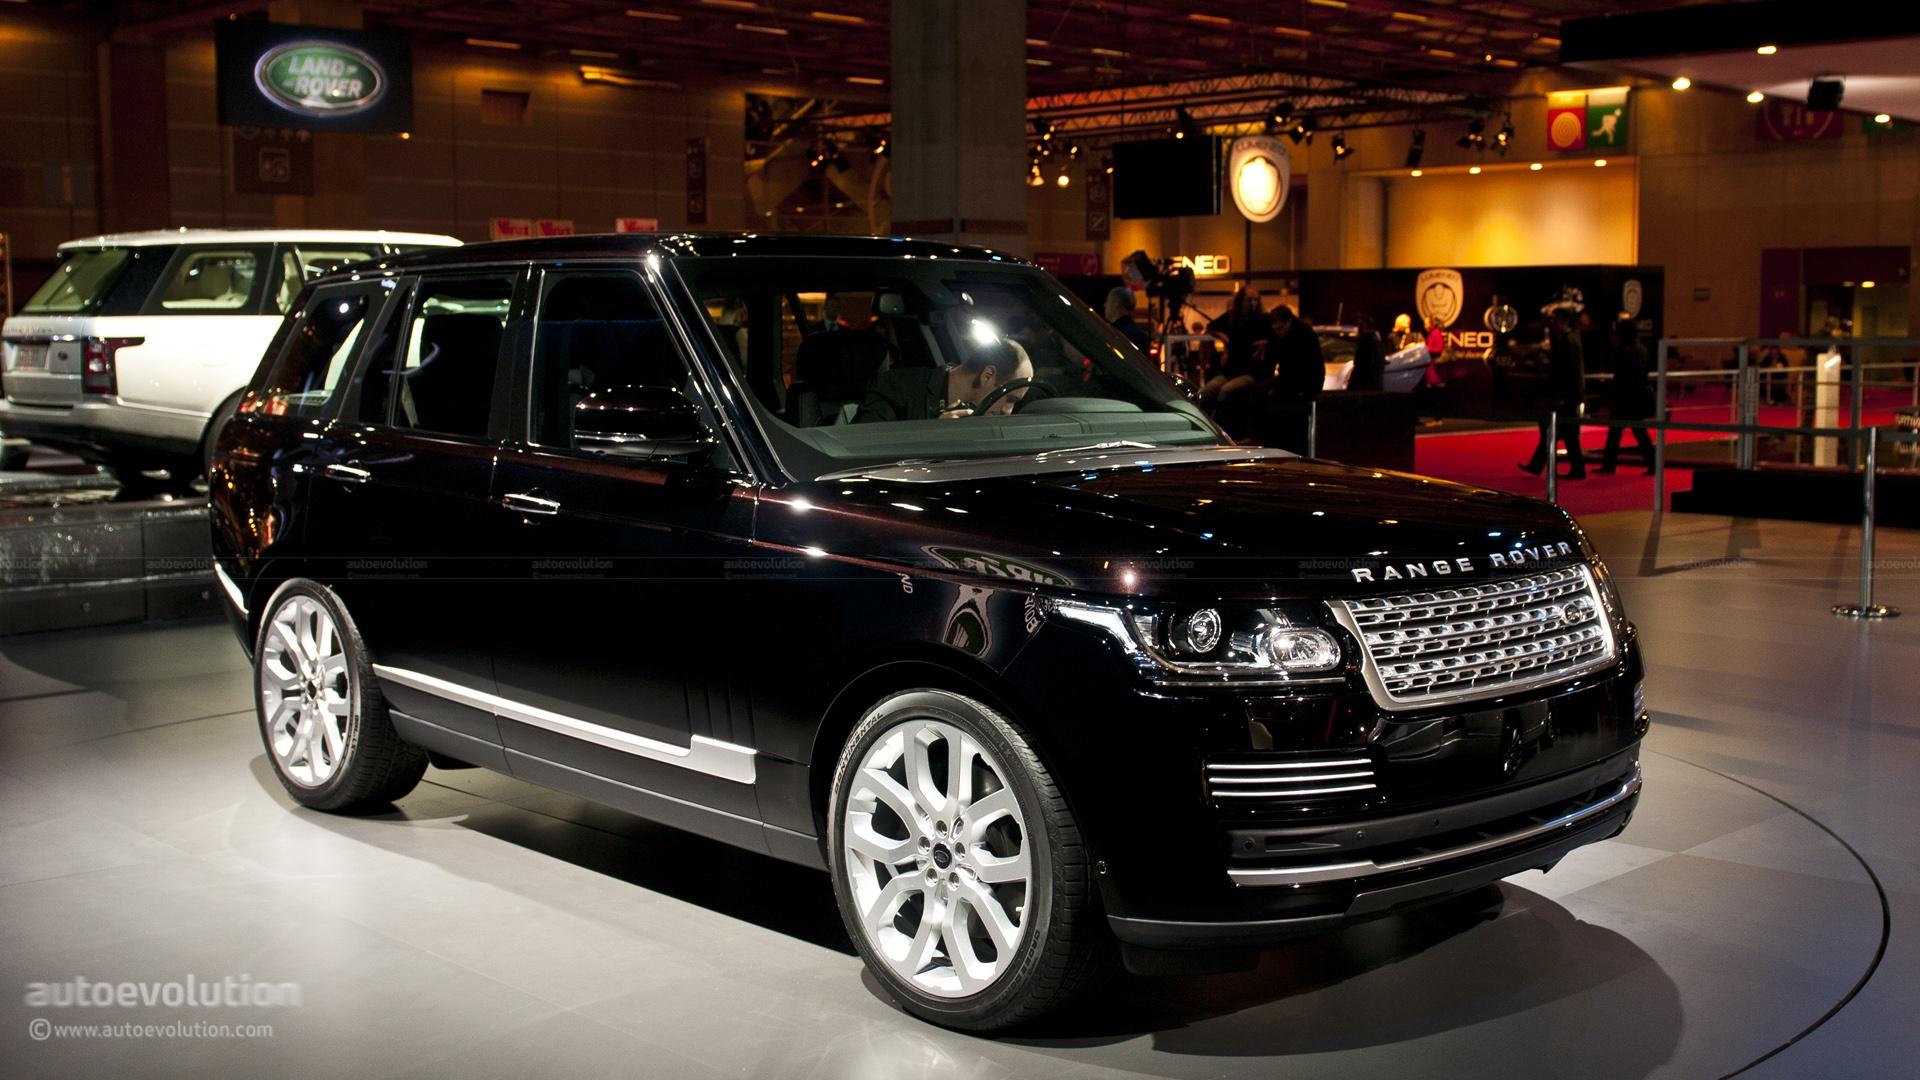 paris 2012 new range rover in detail live photos autoevolution. Black Bedroom Furniture Sets. Home Design Ideas